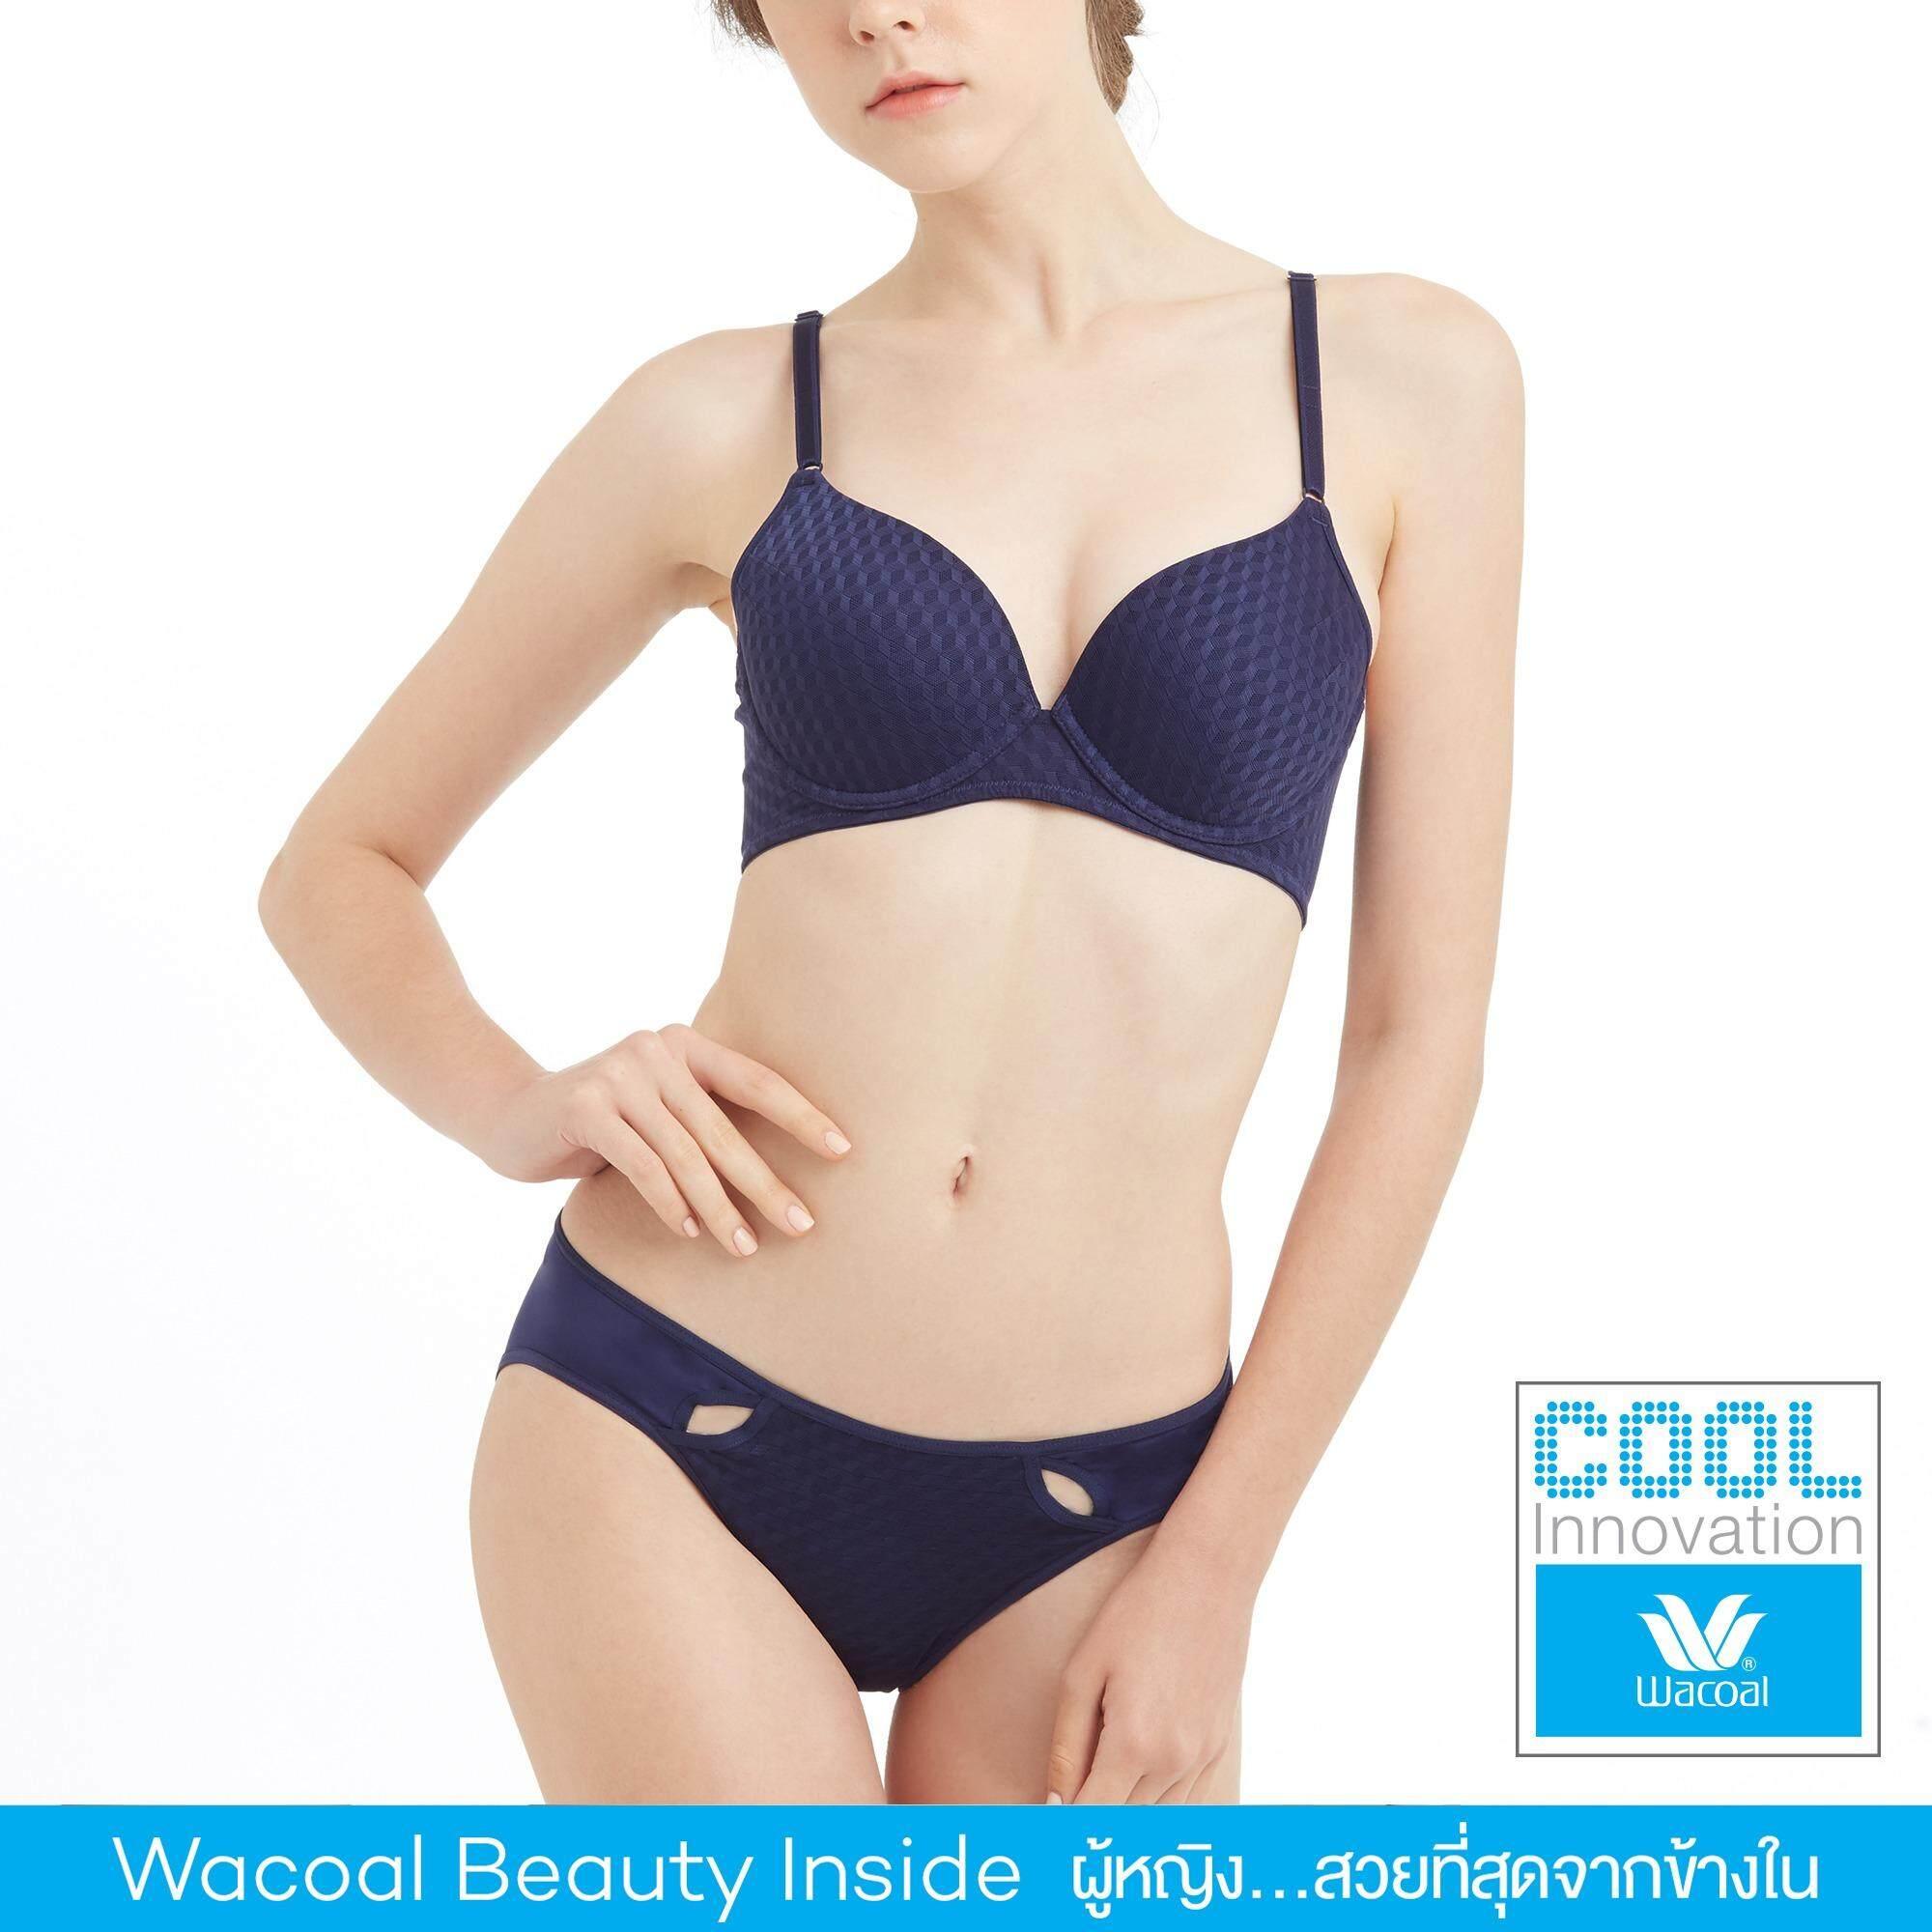 Wacoal Cool innovation เซ็ทชุดชั้นในกางเกงชั้นใน Push up Bra 3/4 Cup (สีน้ำเงินเข้ม/NAVY BLUE) - WB3K21NB-W63K21NB